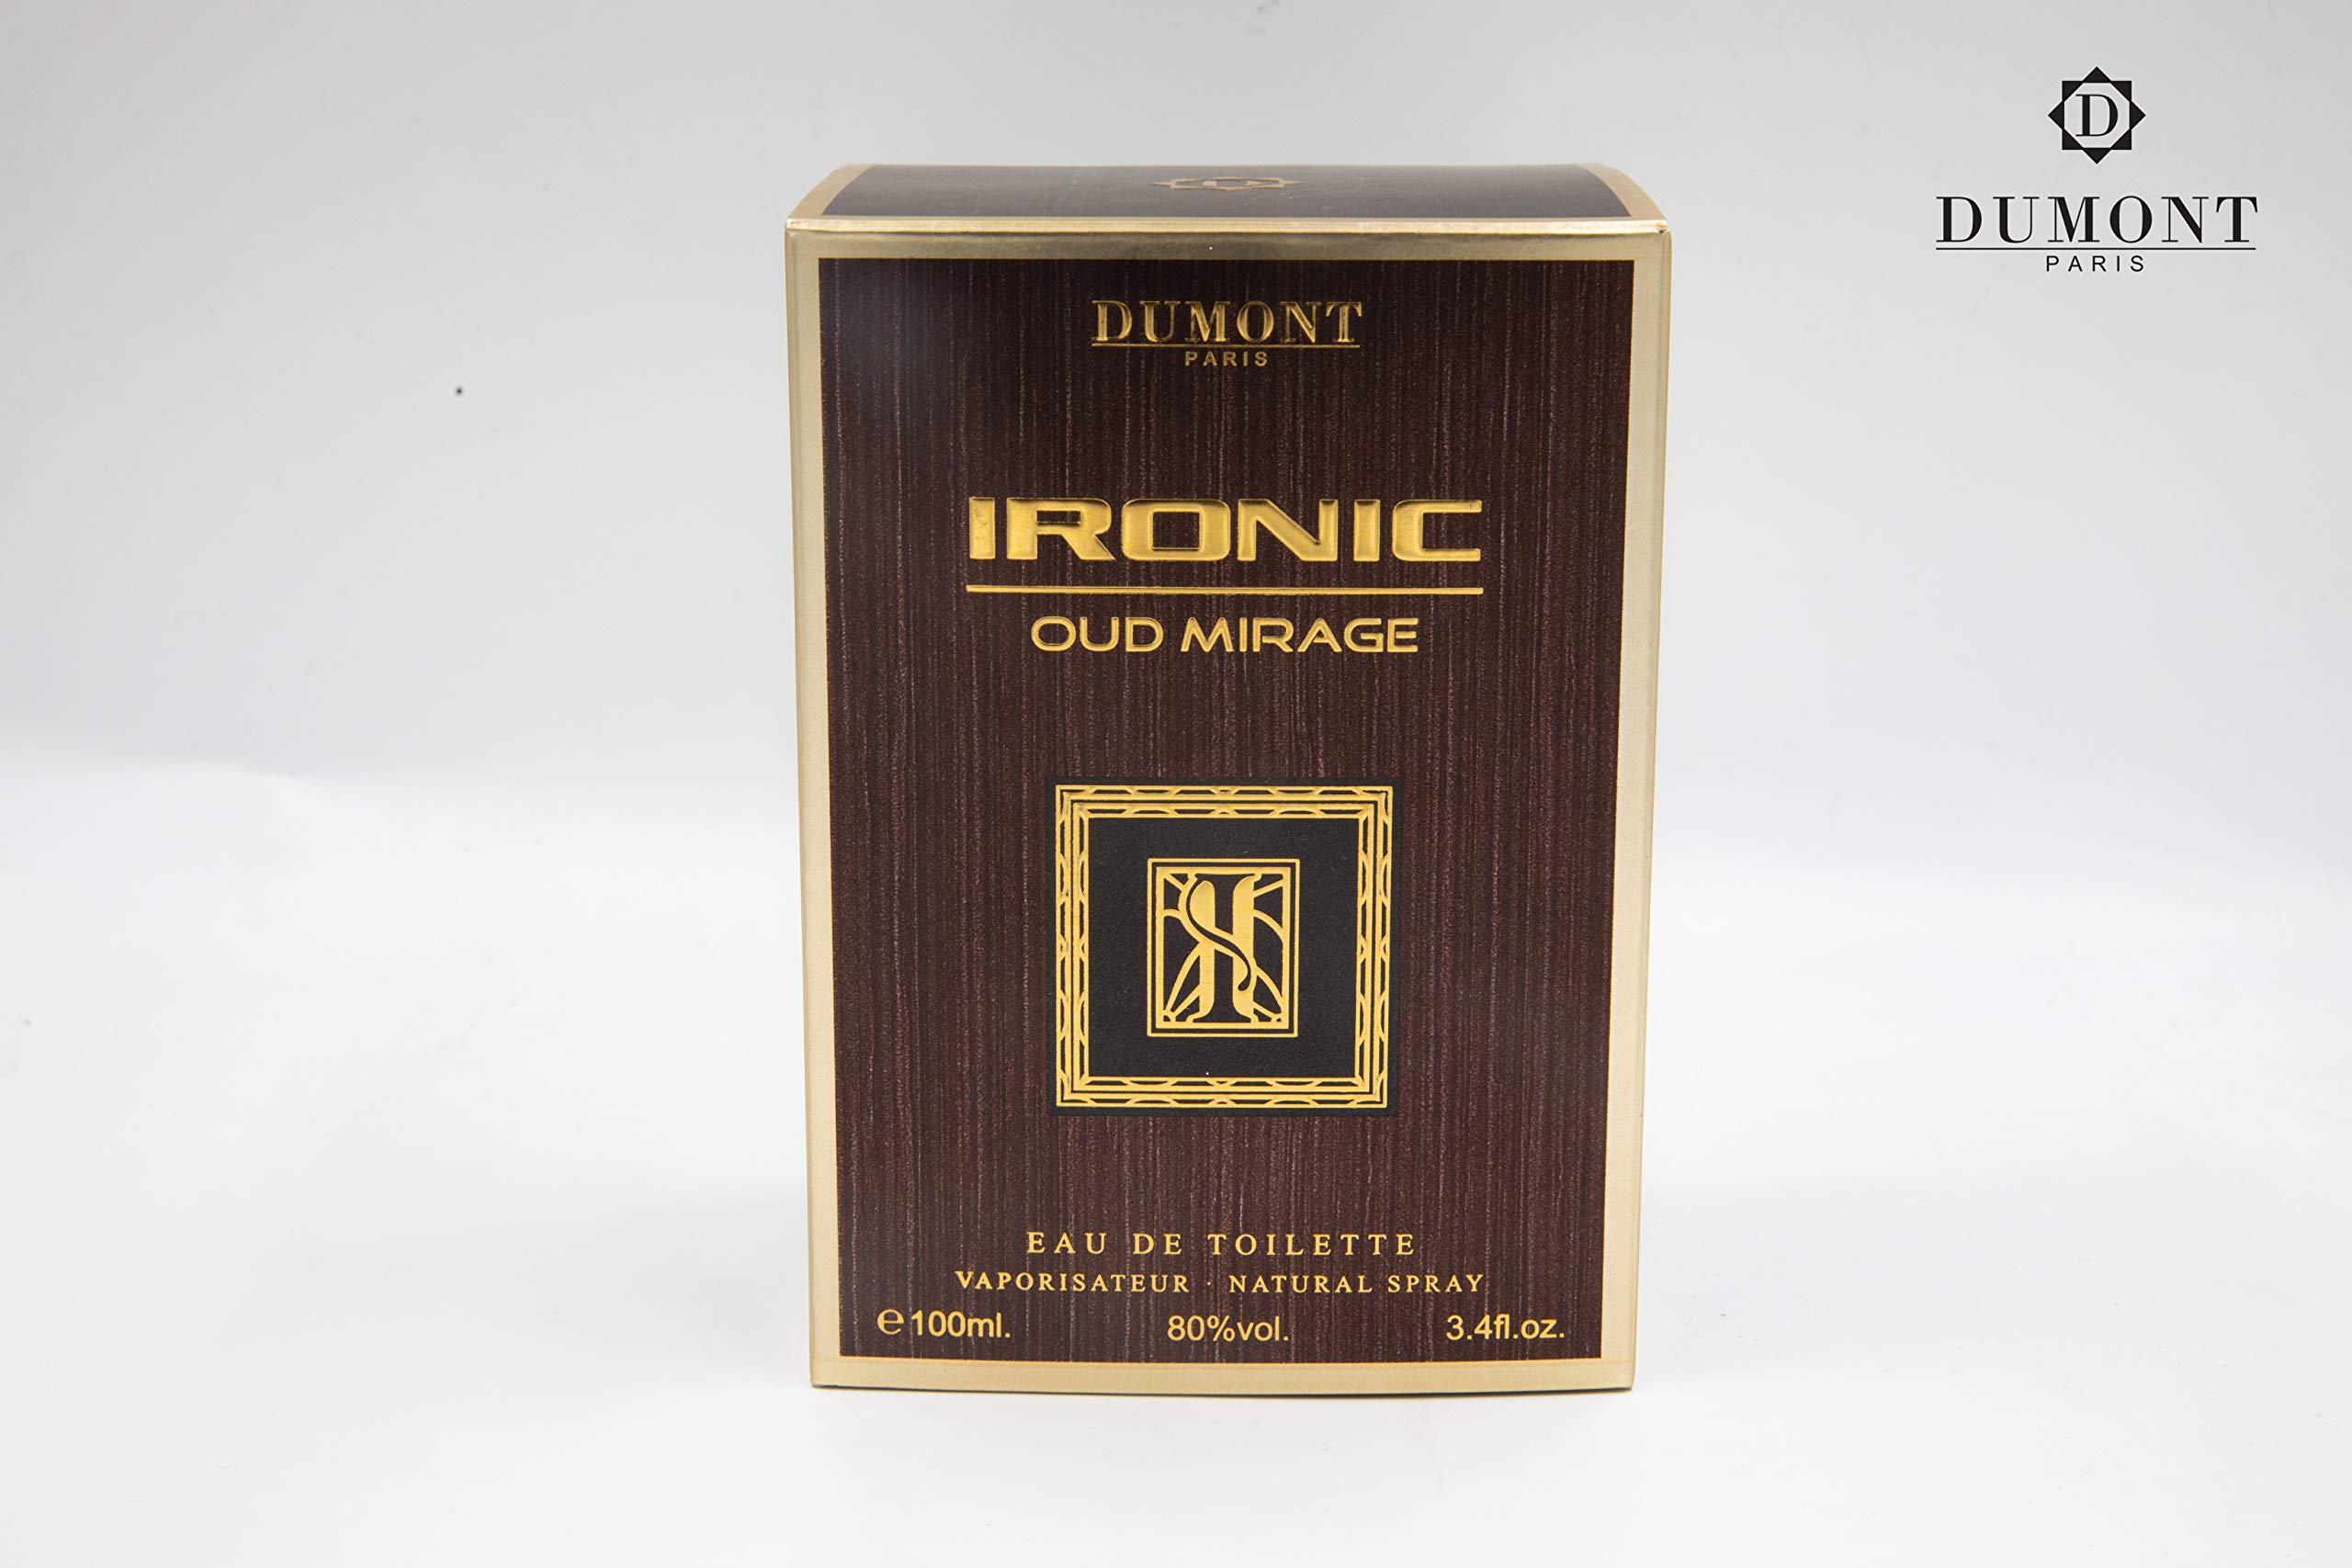 Dumont Ironic Oud Mirage Pour Homme (3.4 Fl. Oz) Eau De Perfum – Perfume Body Spray for Men, Boys, Him - Long Lasting Cologne with Tobacco, Leather, Grapefruit, Woodsy Masculine Scent